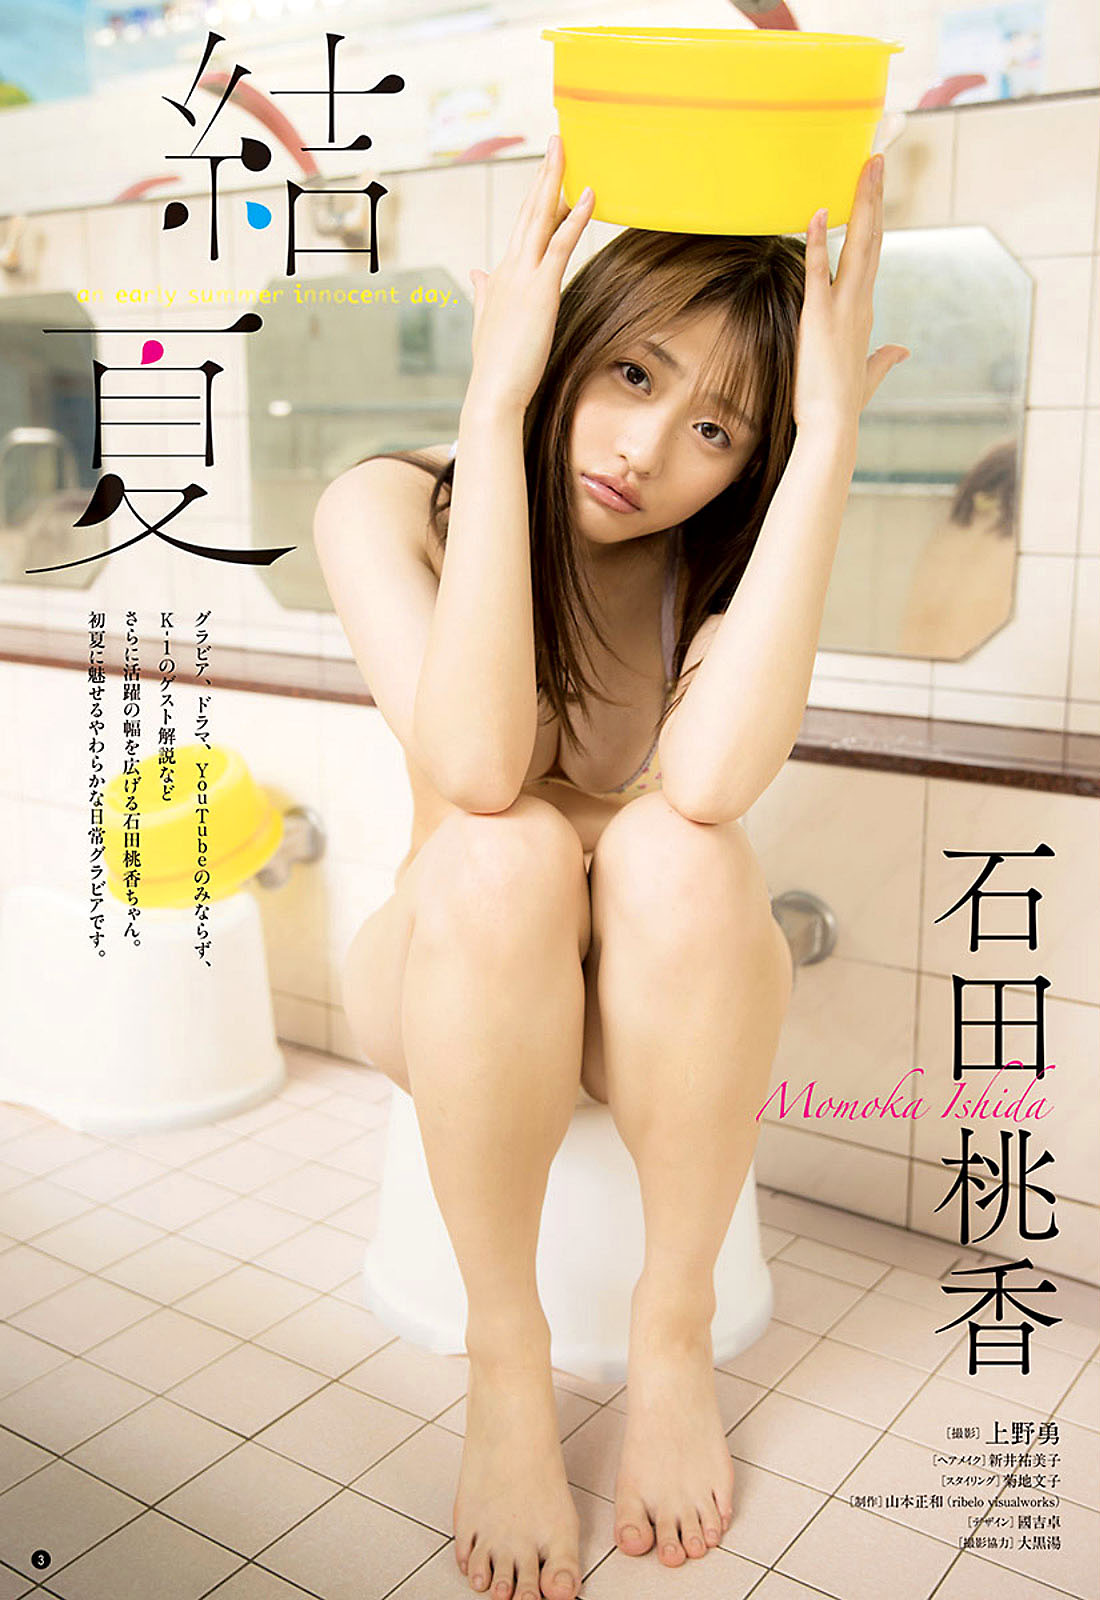 Momoka Ishida Young Champion 210713 02.jpg